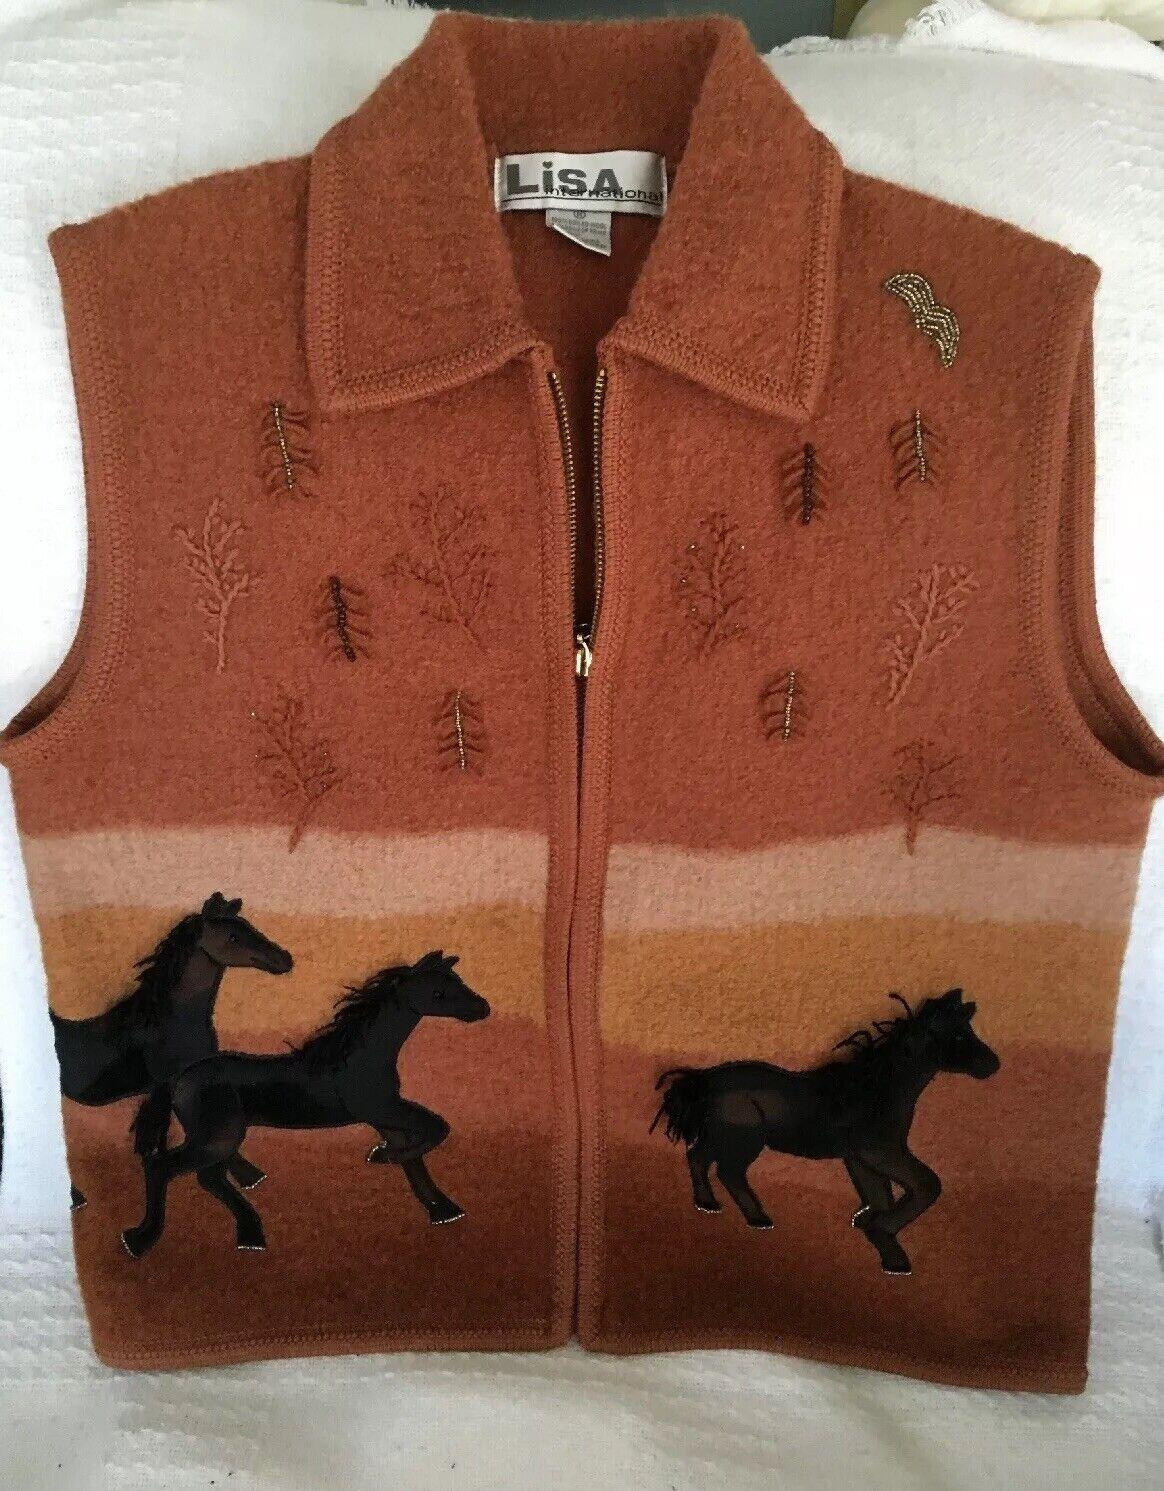 Lisa International International International Medium Rust Boiled Wool Horse Vest 8eaa73